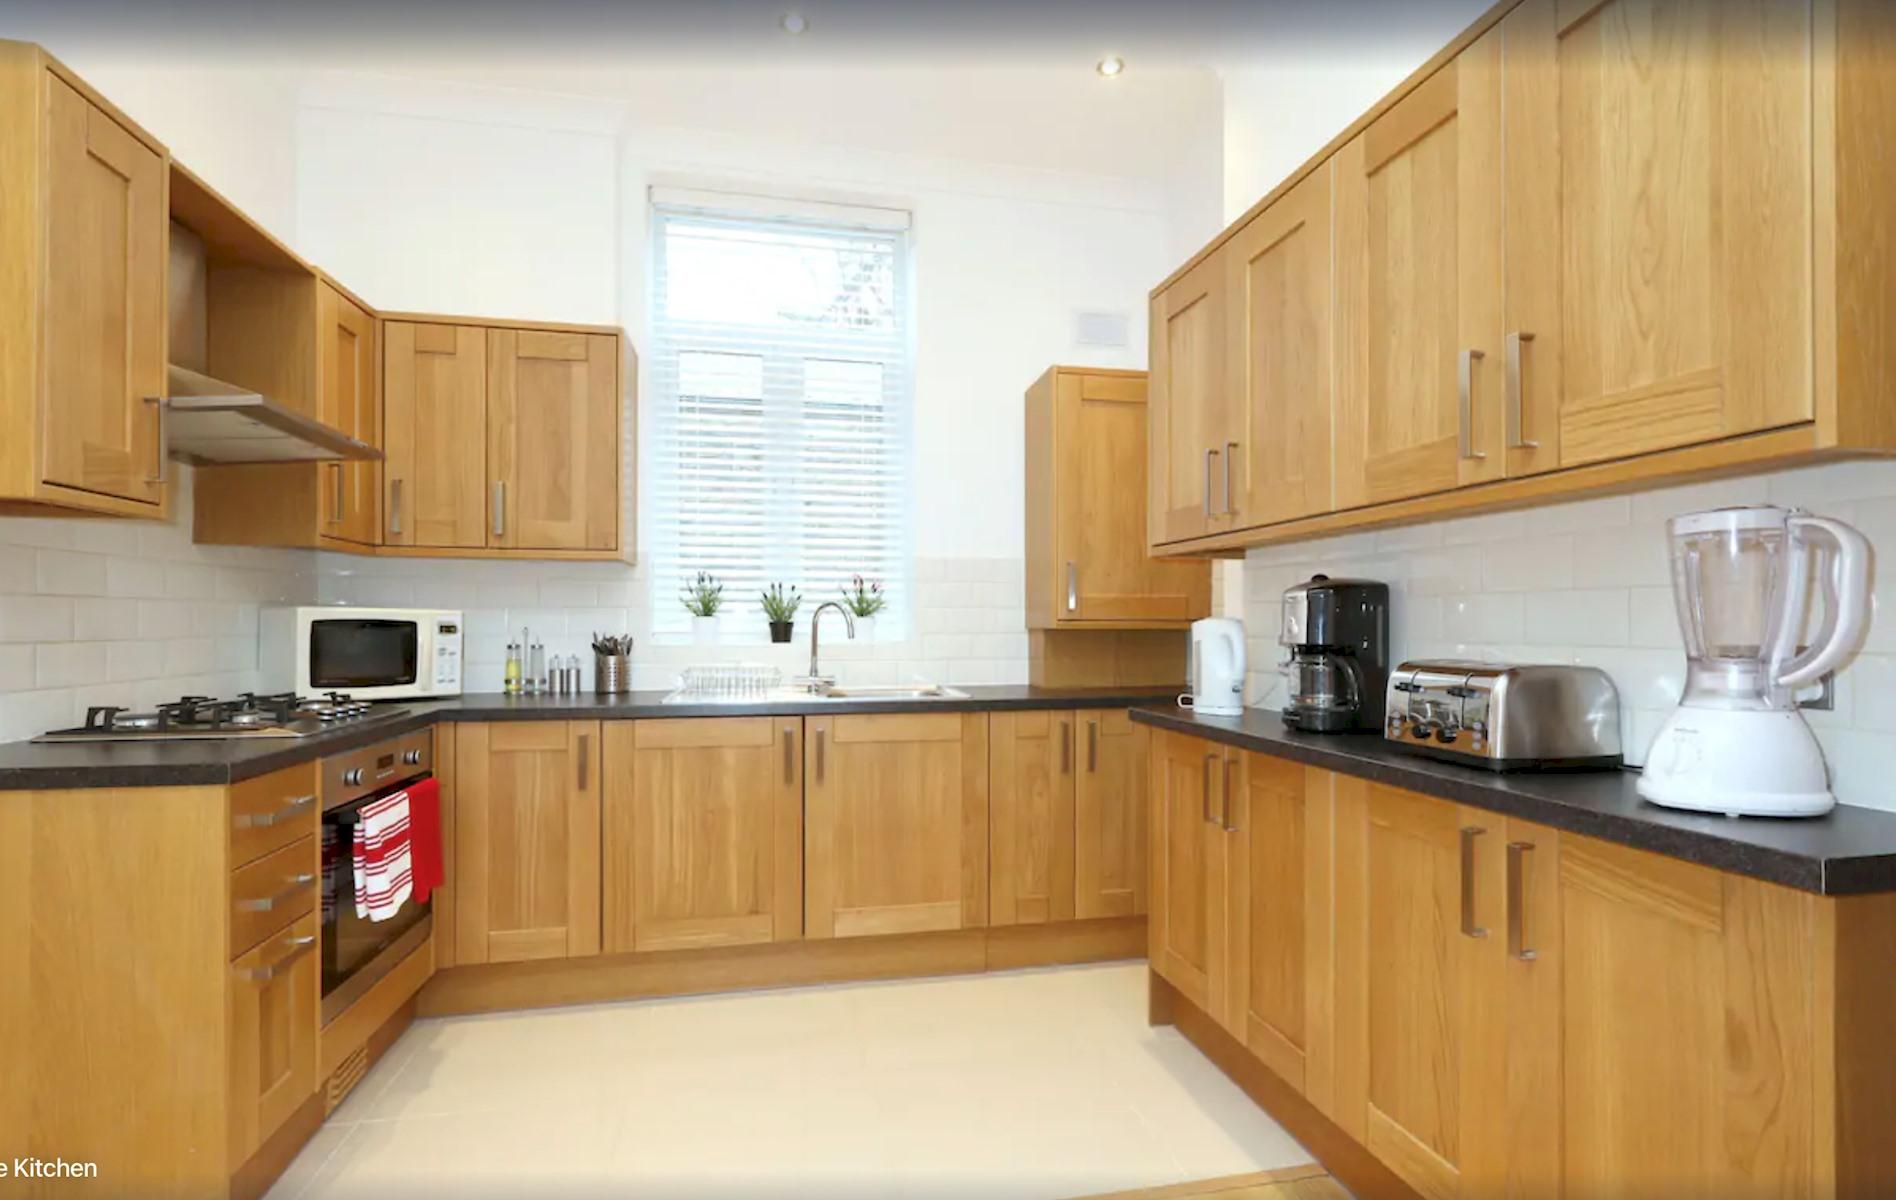 Apartment King s Cross Eurostar Double Room - Shared Bathroom - Shared Kitchen  ROOM 4  photo 25594473